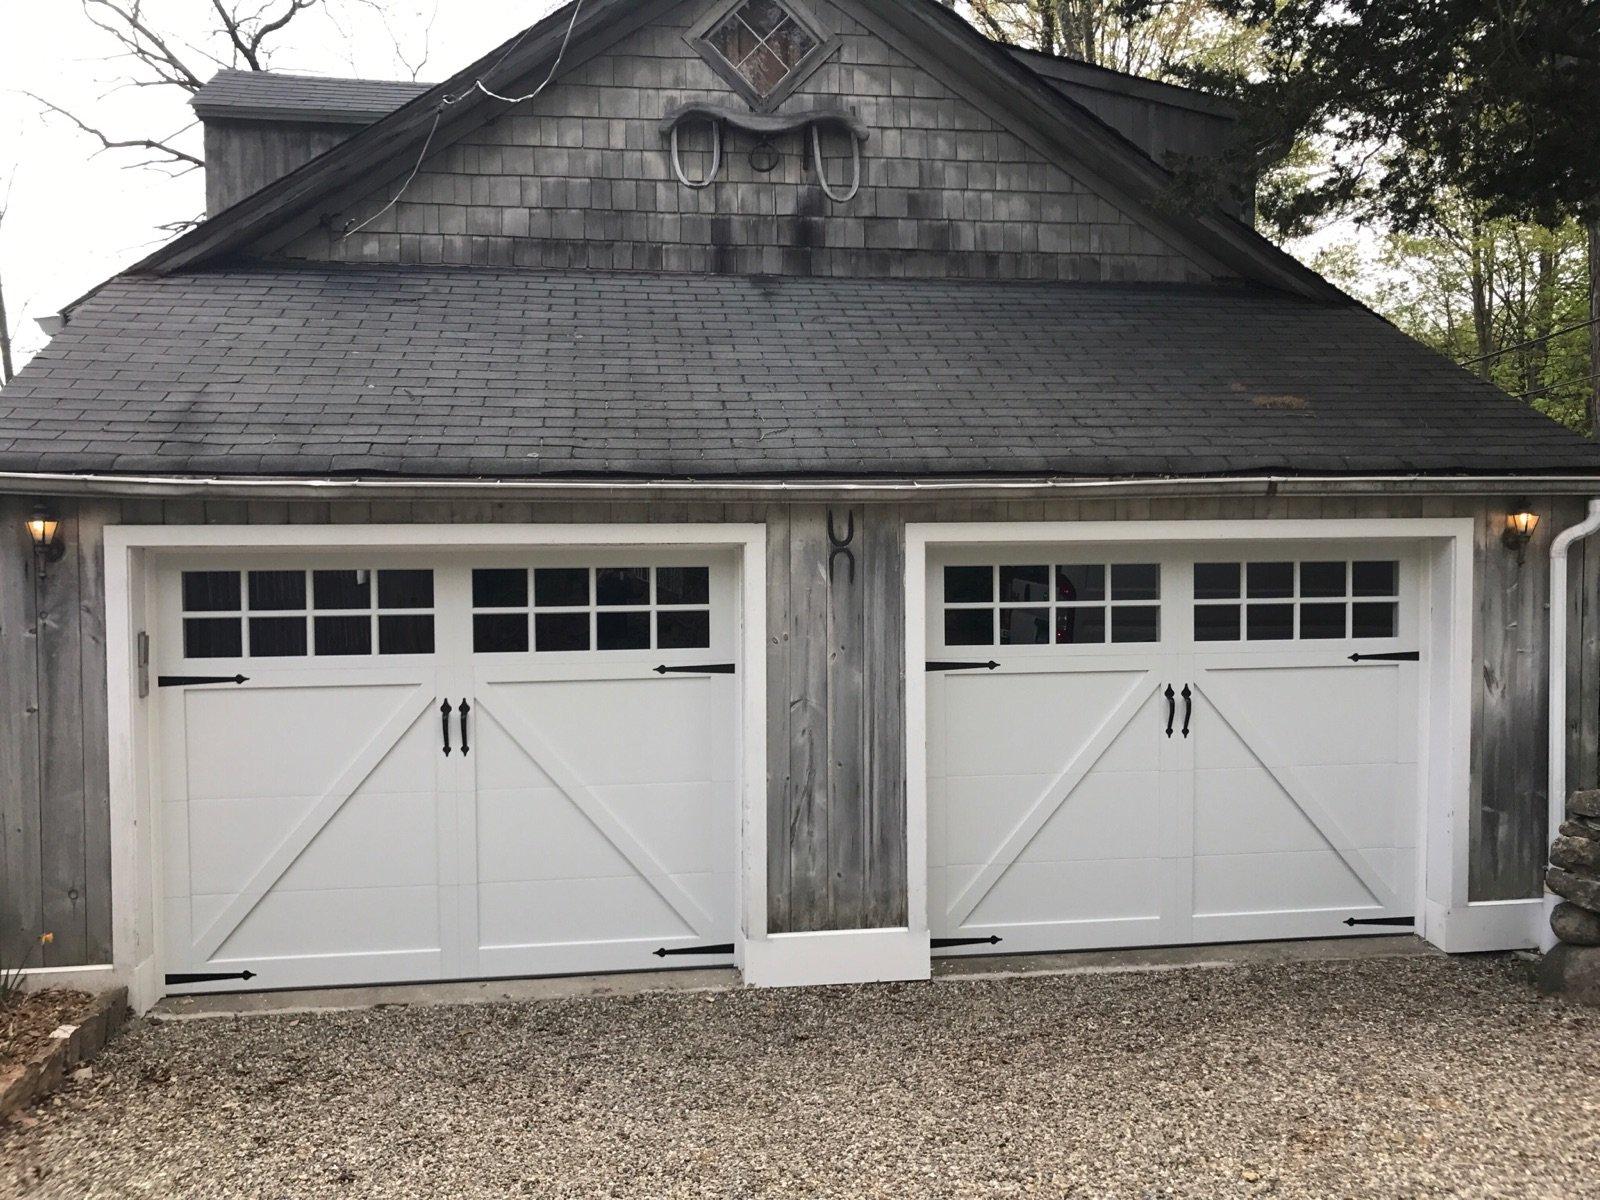 Contact for garage repair greenwich bethel darien ct casella garage door repair weston ct rubansaba